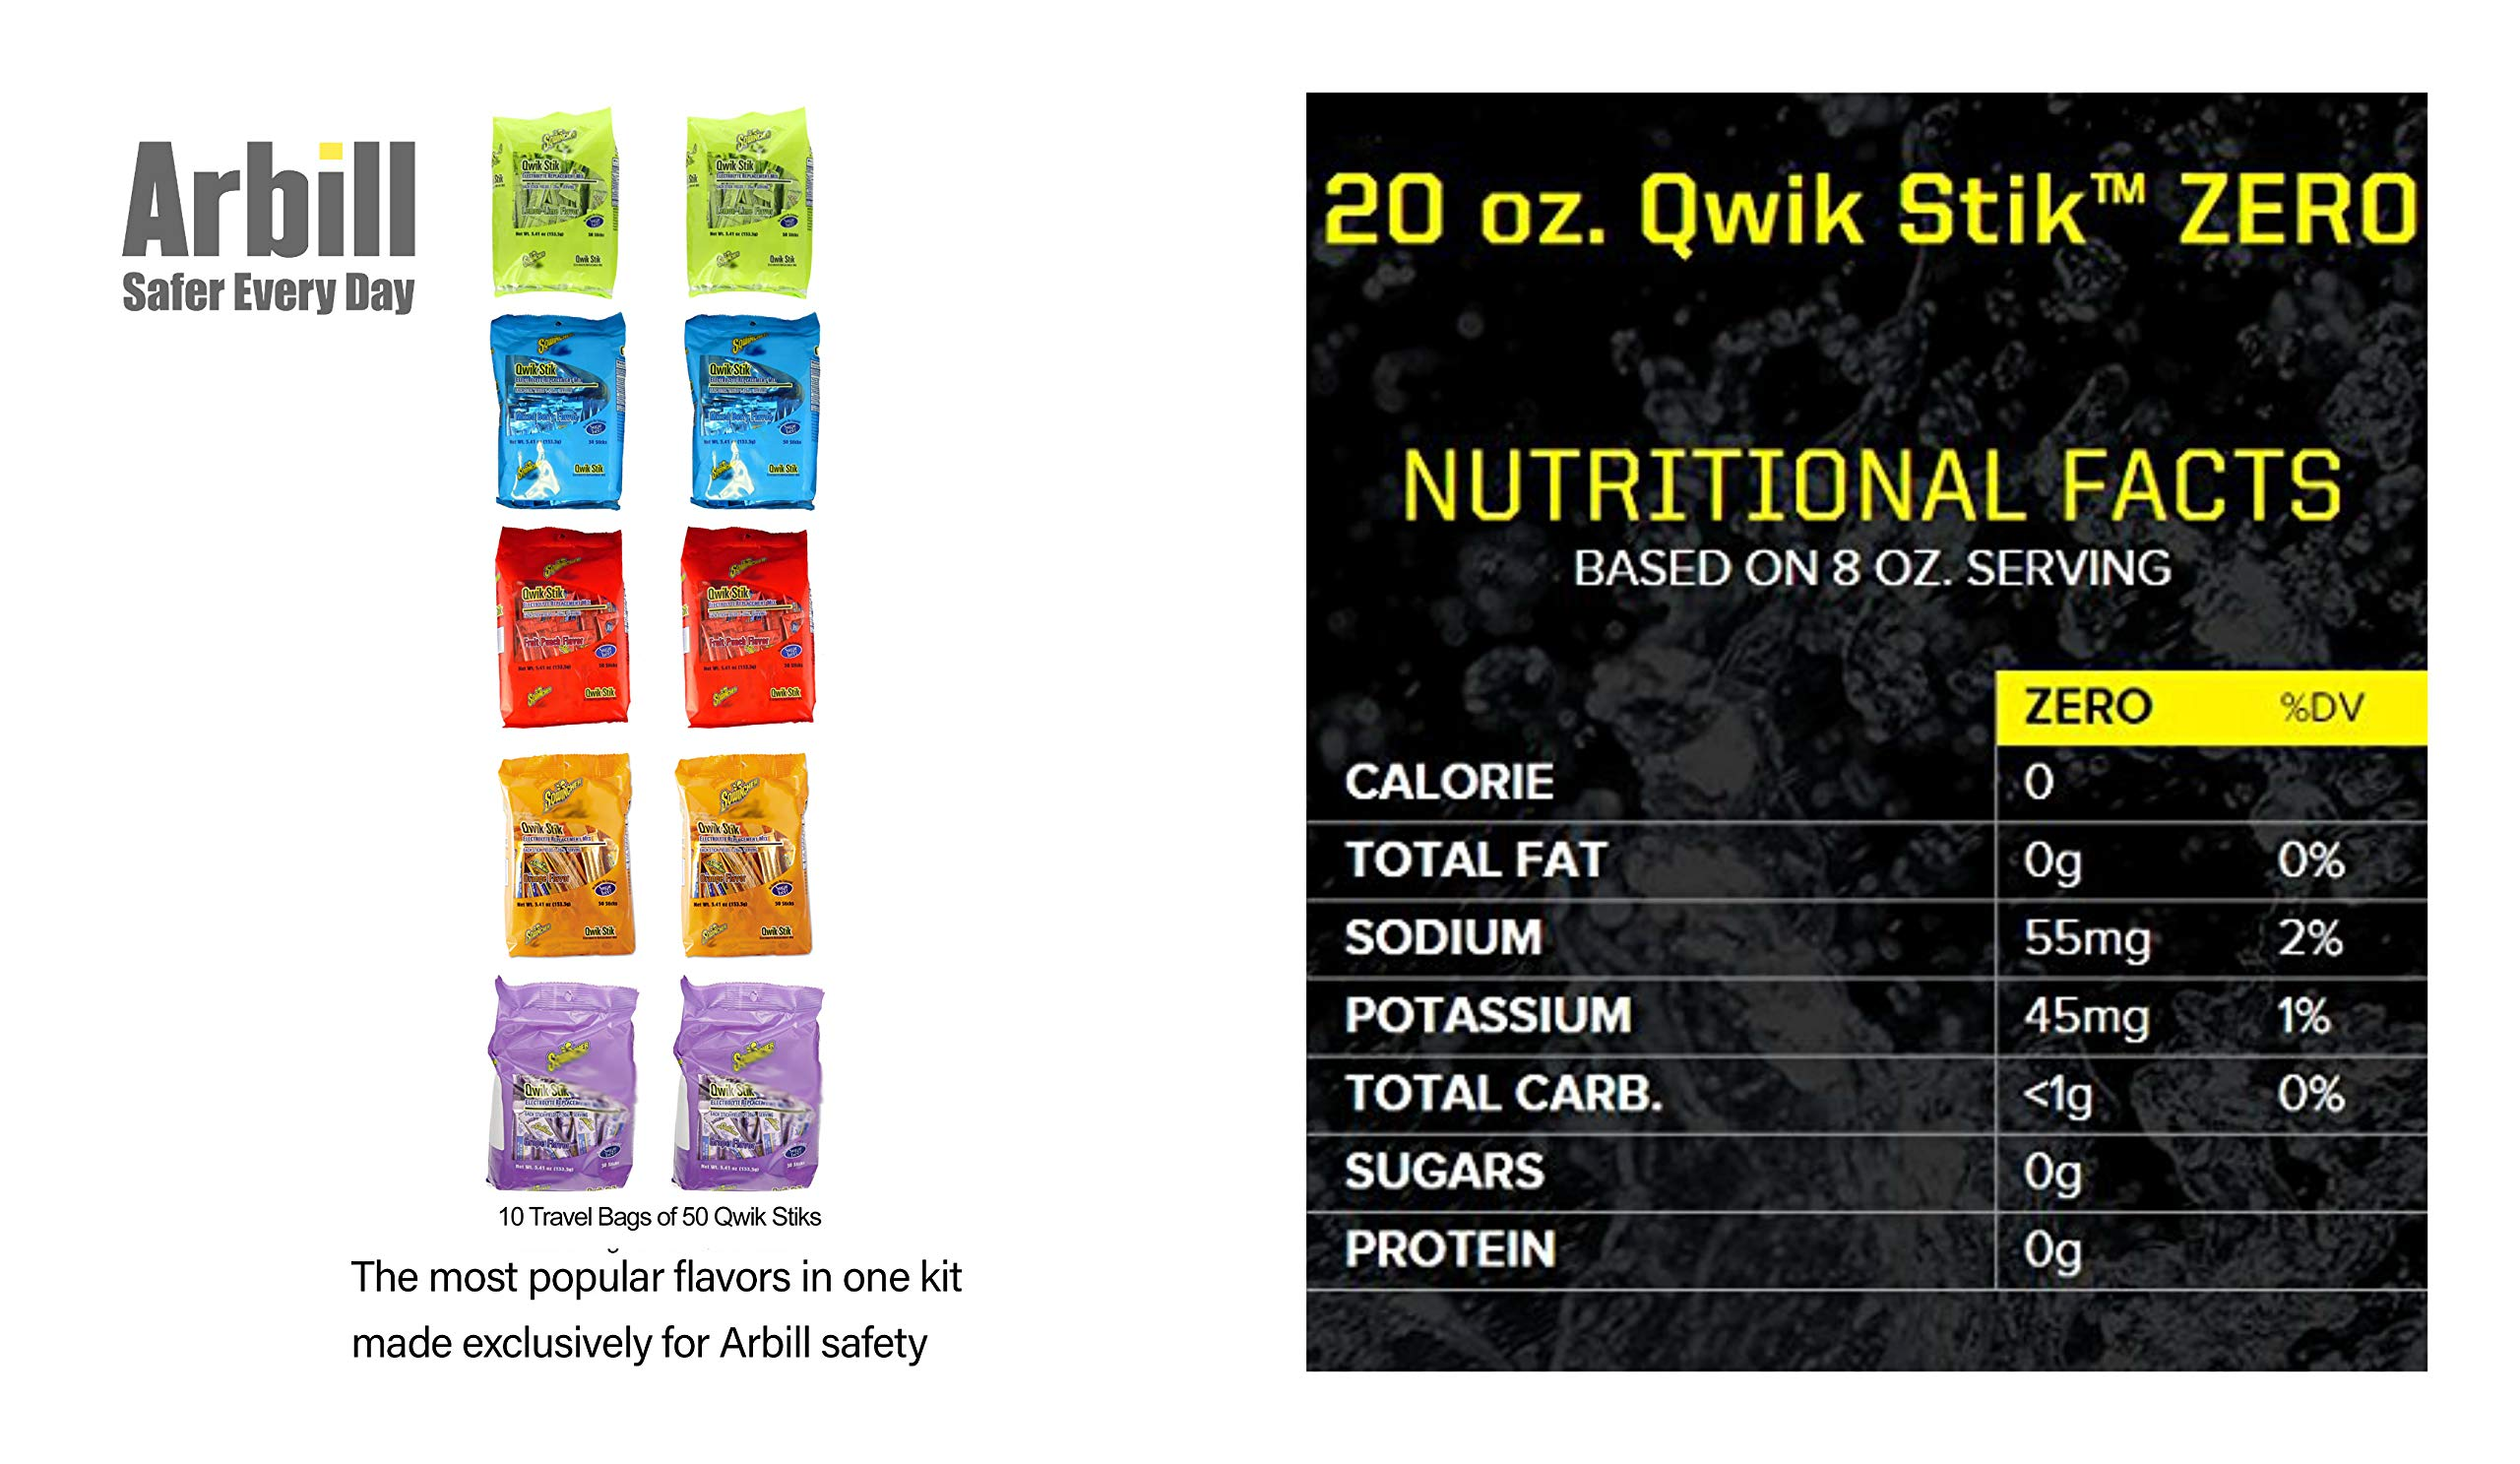 Sqwincher ZERO 5 Flavor Qwik Stik (500 Stik Assorted Pack) Sugar Free Electrolyte Powdered Beverage Mix by Sqwincher (Image #2)